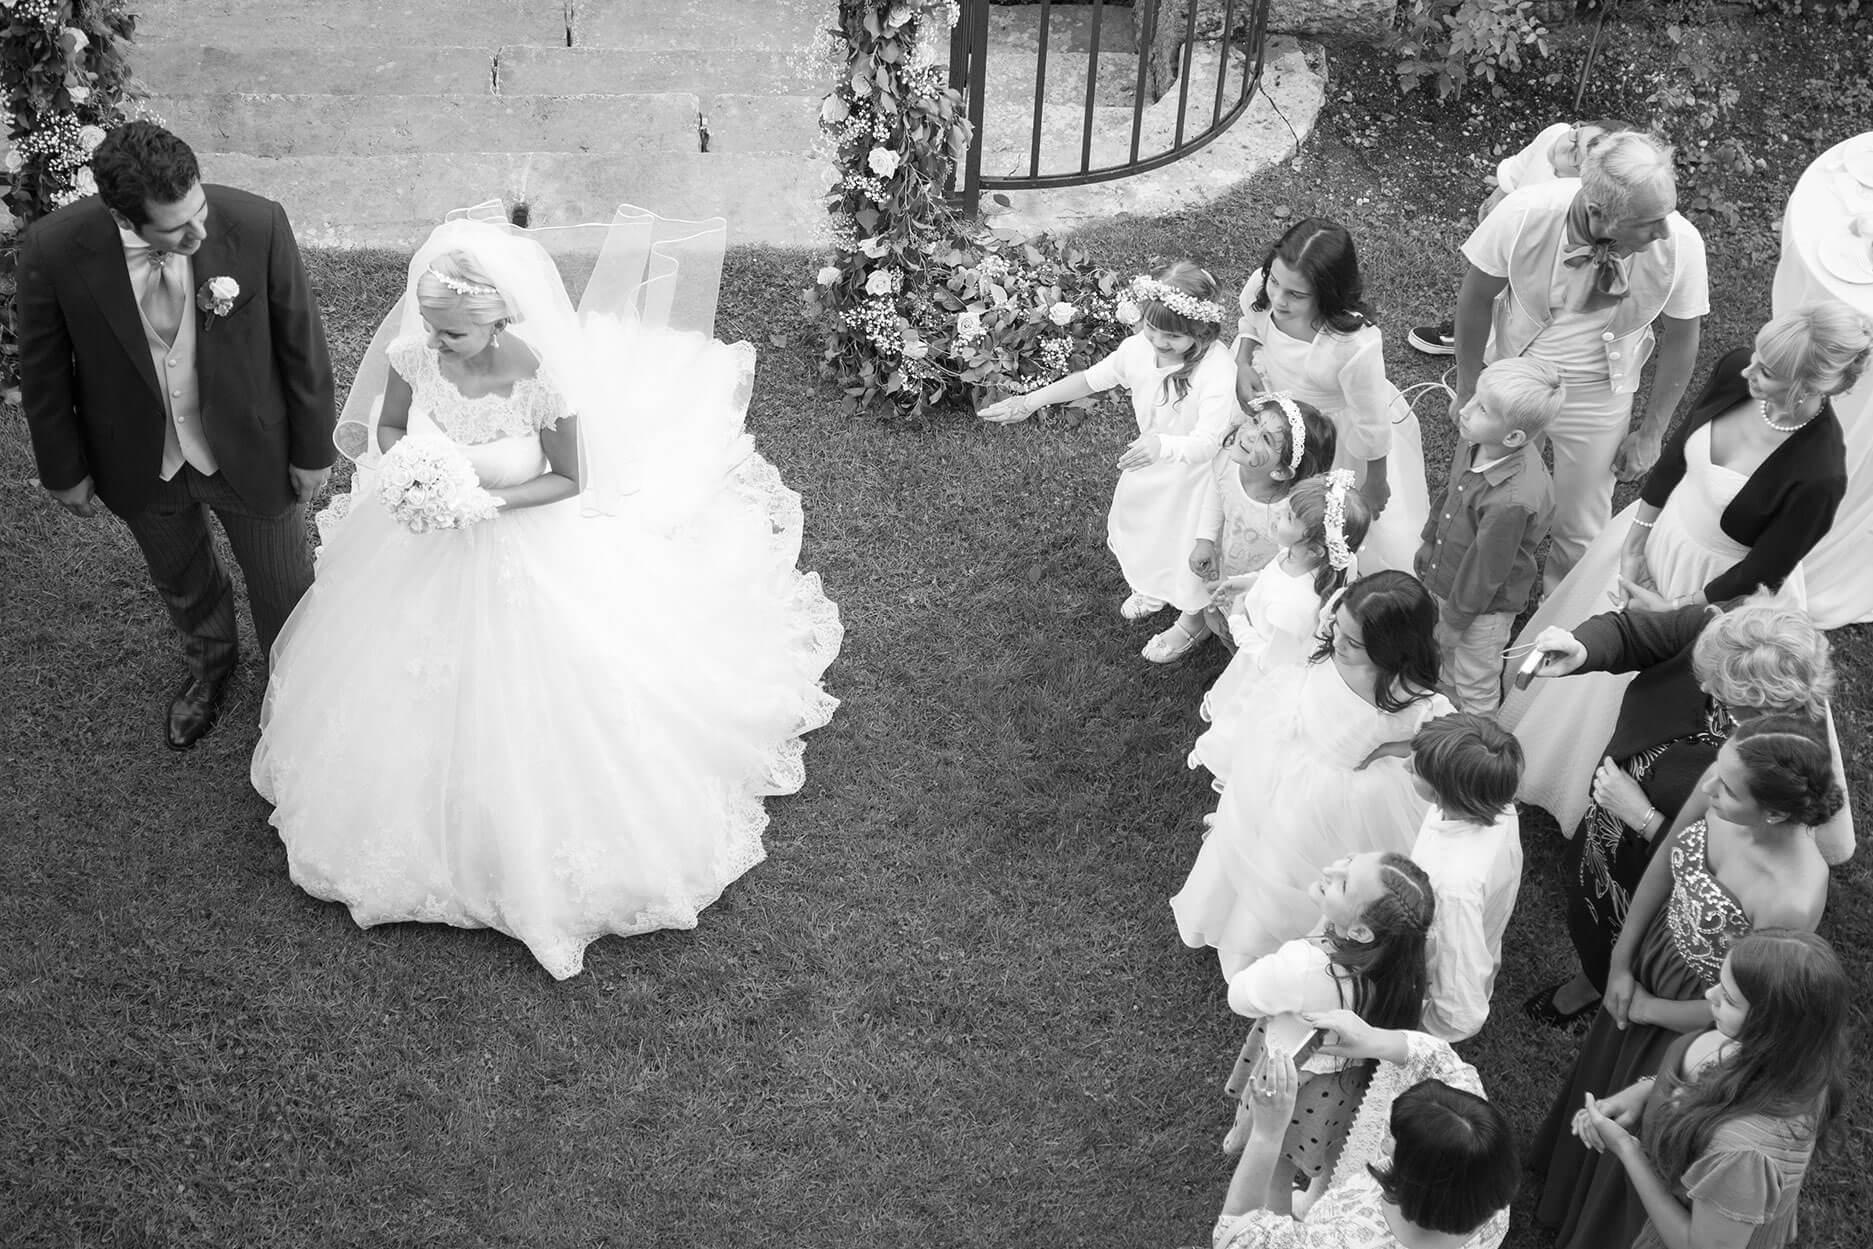 Francesca-Ferrati-WeddingIMG_0033